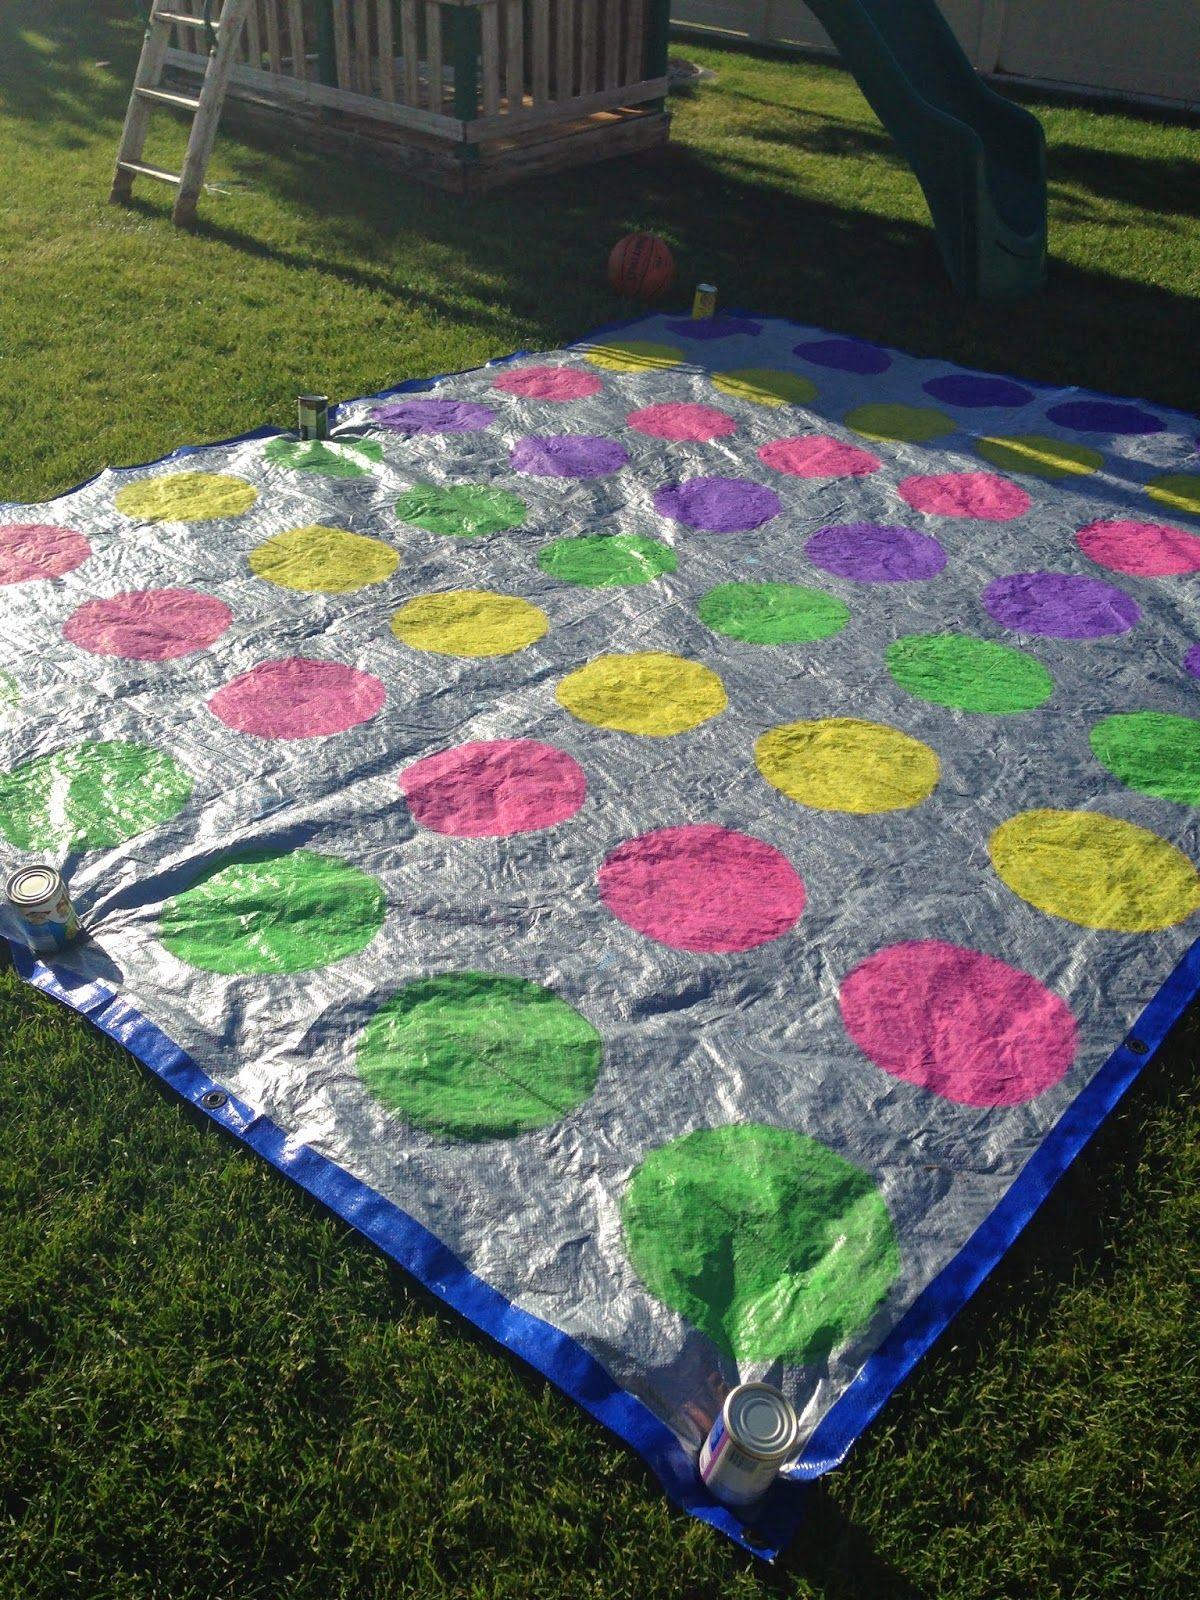 Diy Giant Yard Twister Game With Shaving Cream Springfest Yard